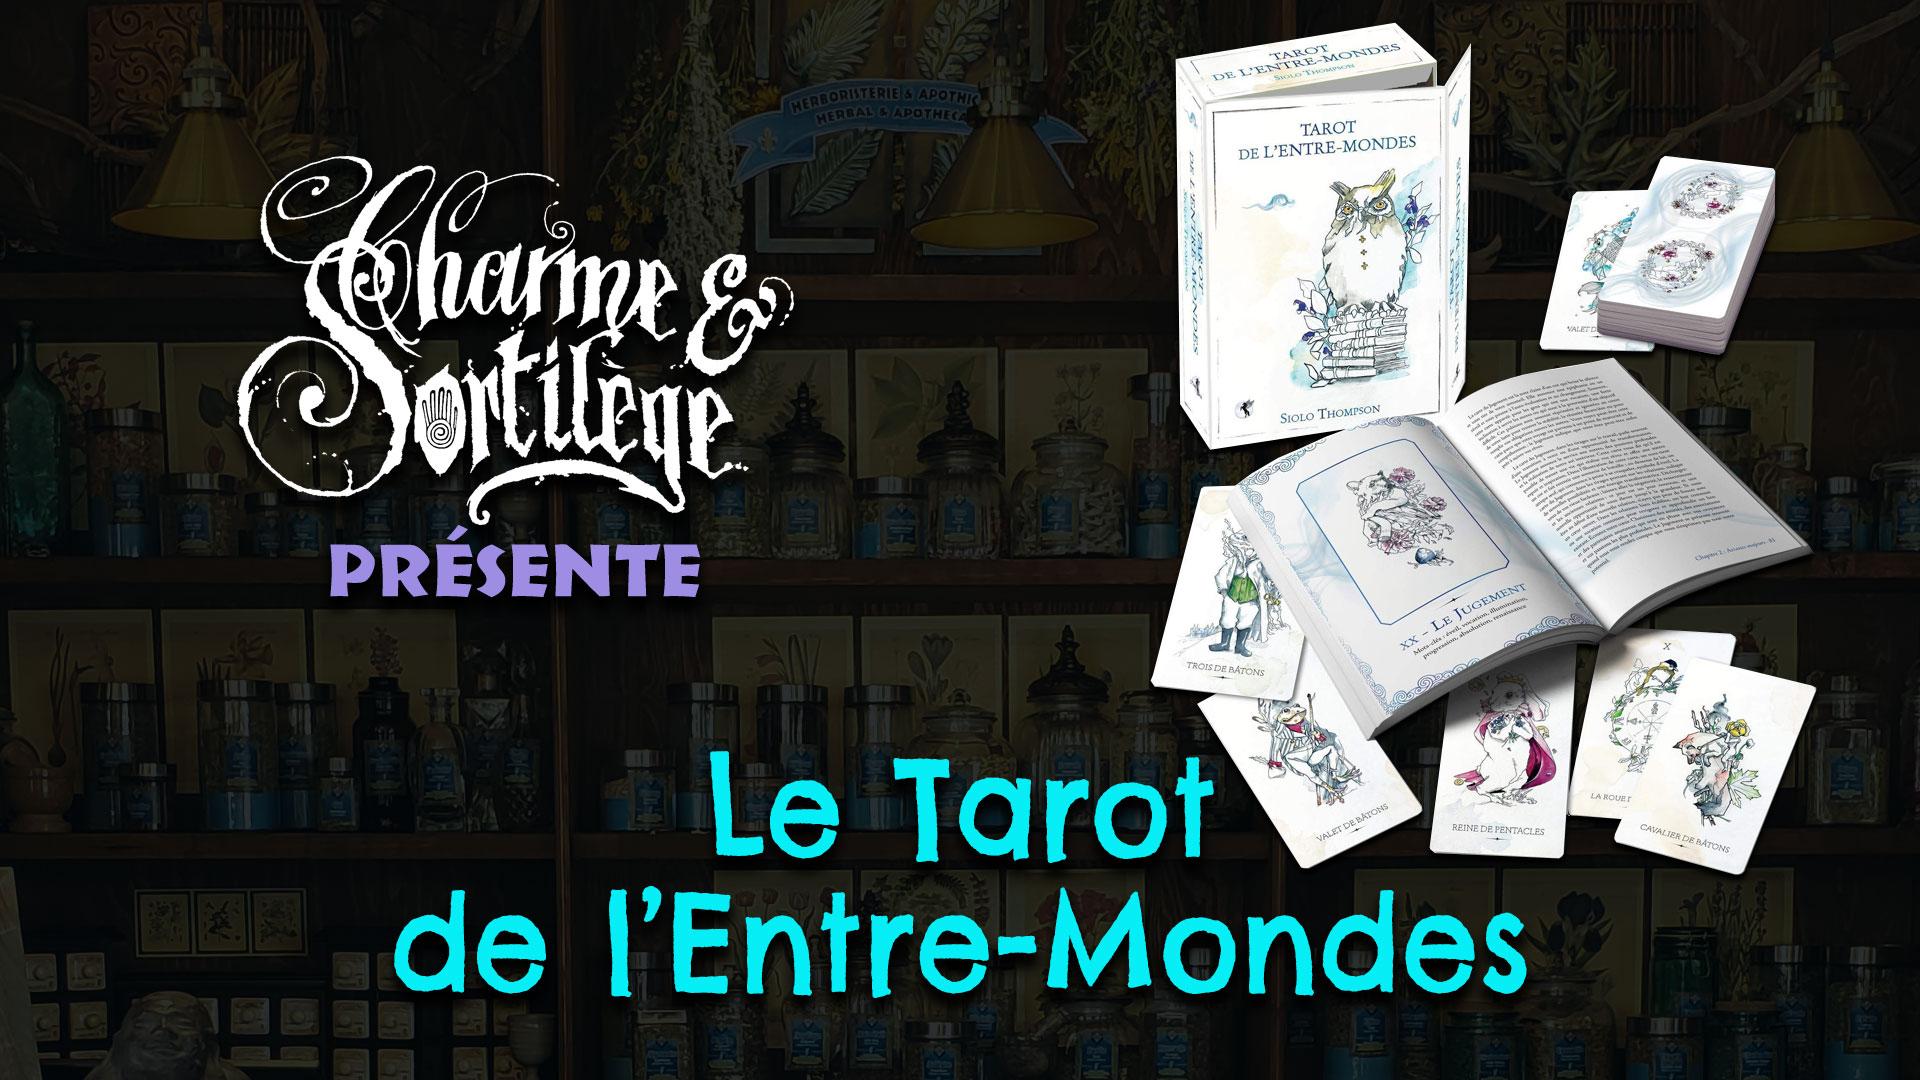 Présentation Tarots : le Tarot de l'Entre-Mondes